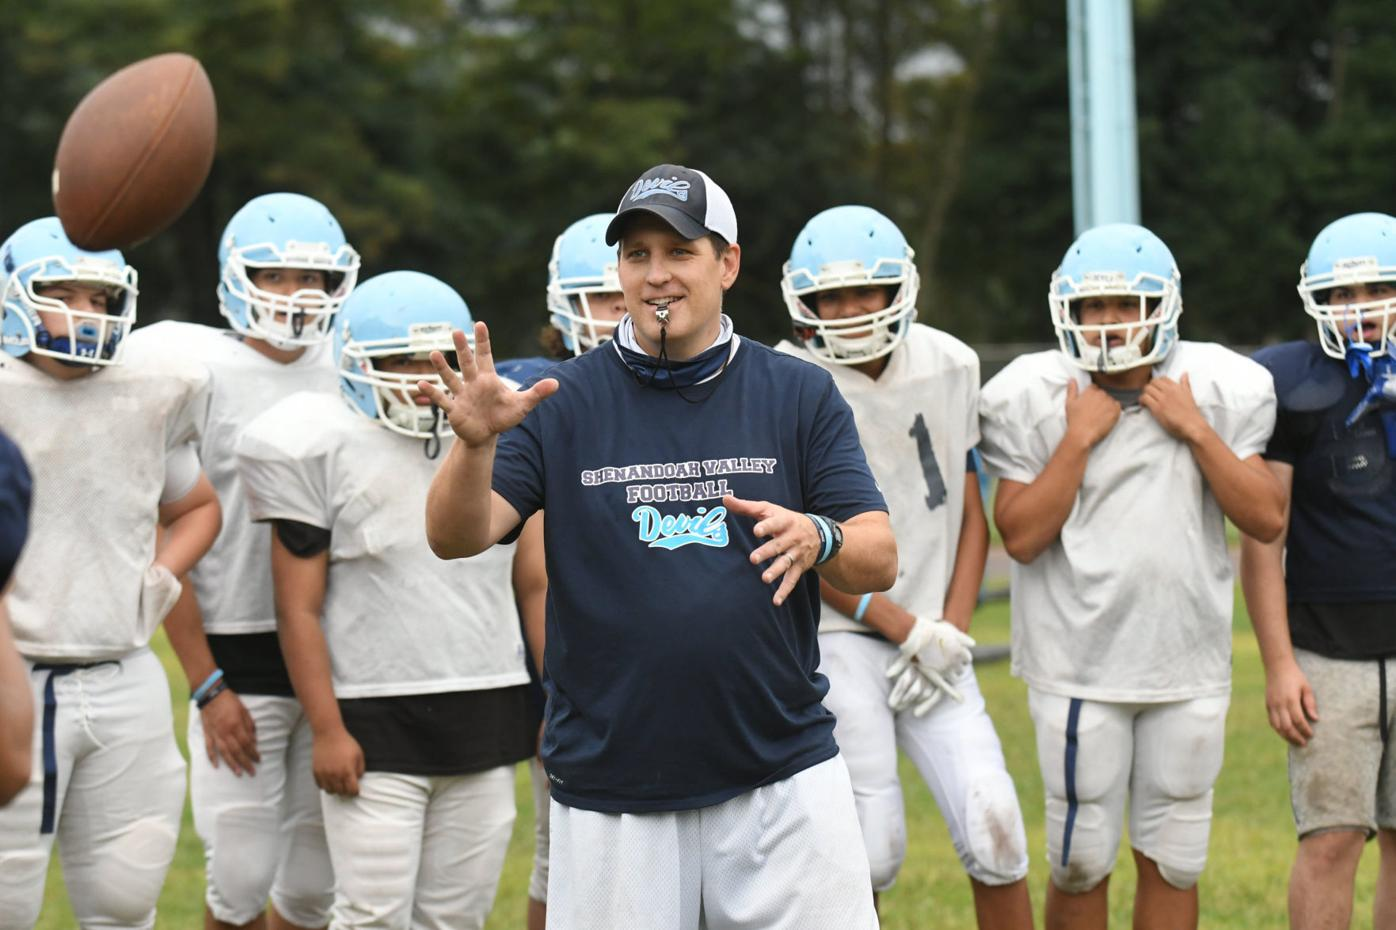 New coach has goals for Blue Devils